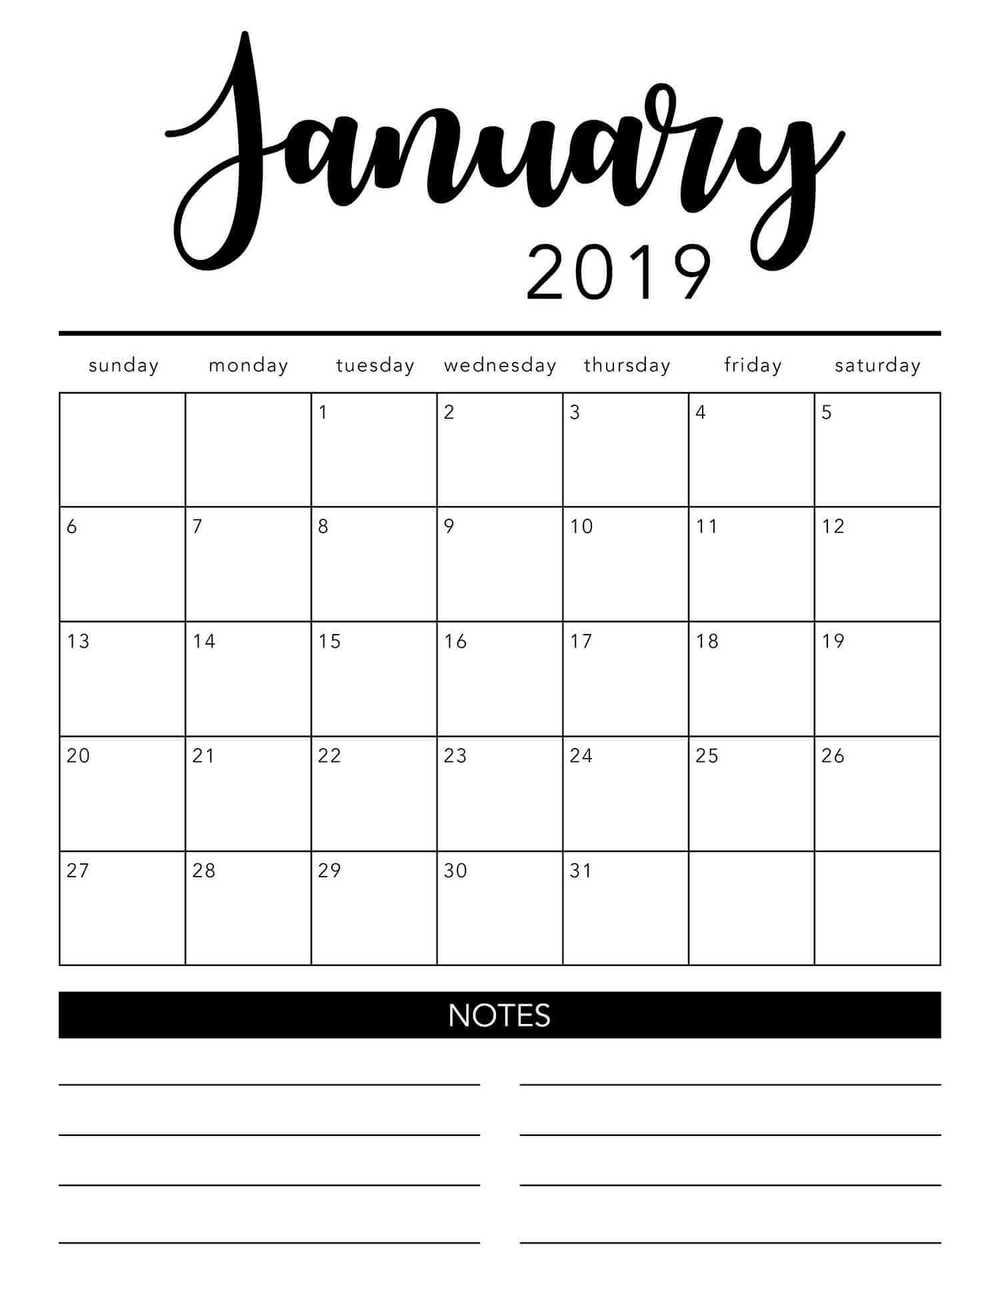 Free 2019 Printable Calendar Template (2 Colors!) - I Heart Naptime regarding Calendar Printable Free Template